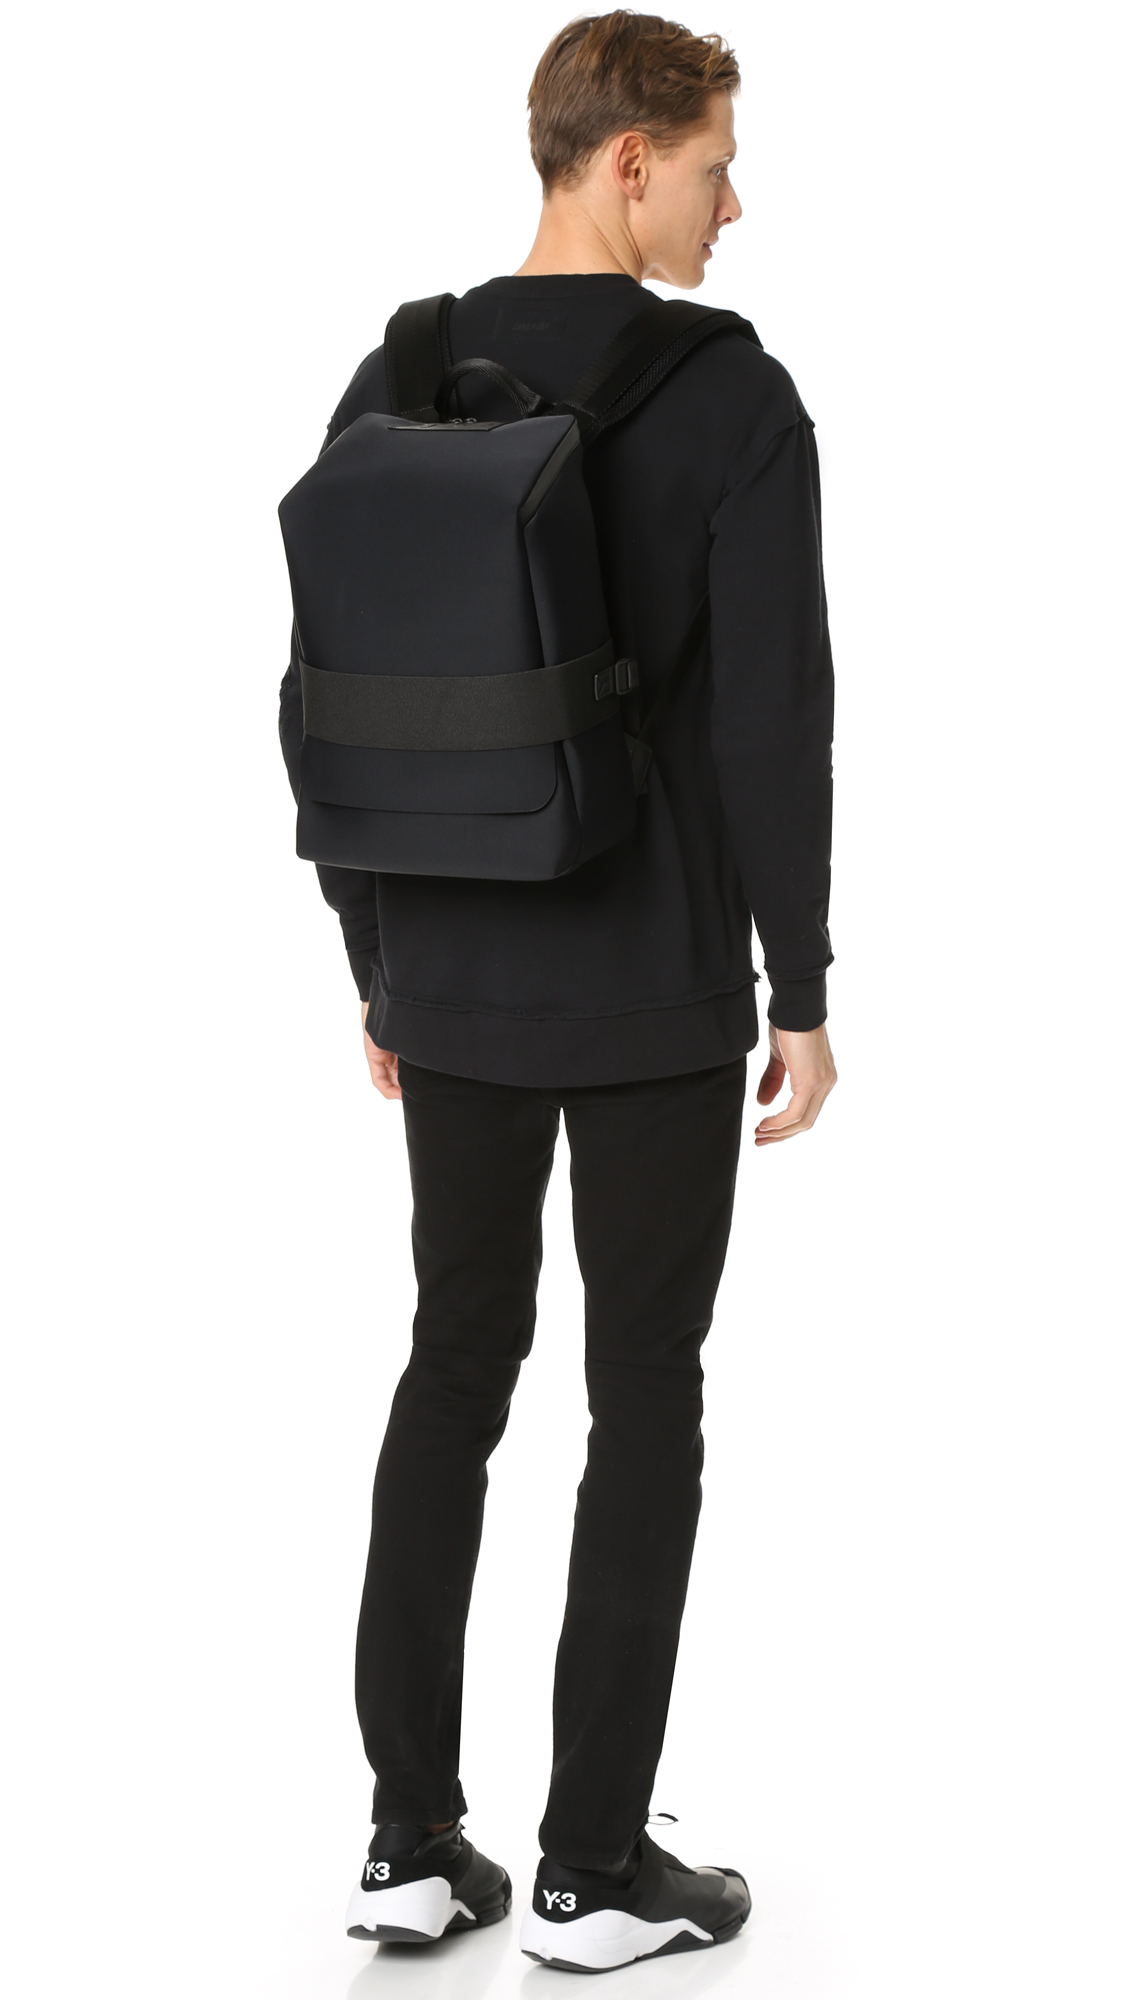 6100ddca5723 Y-3 Small Qasa Backpack